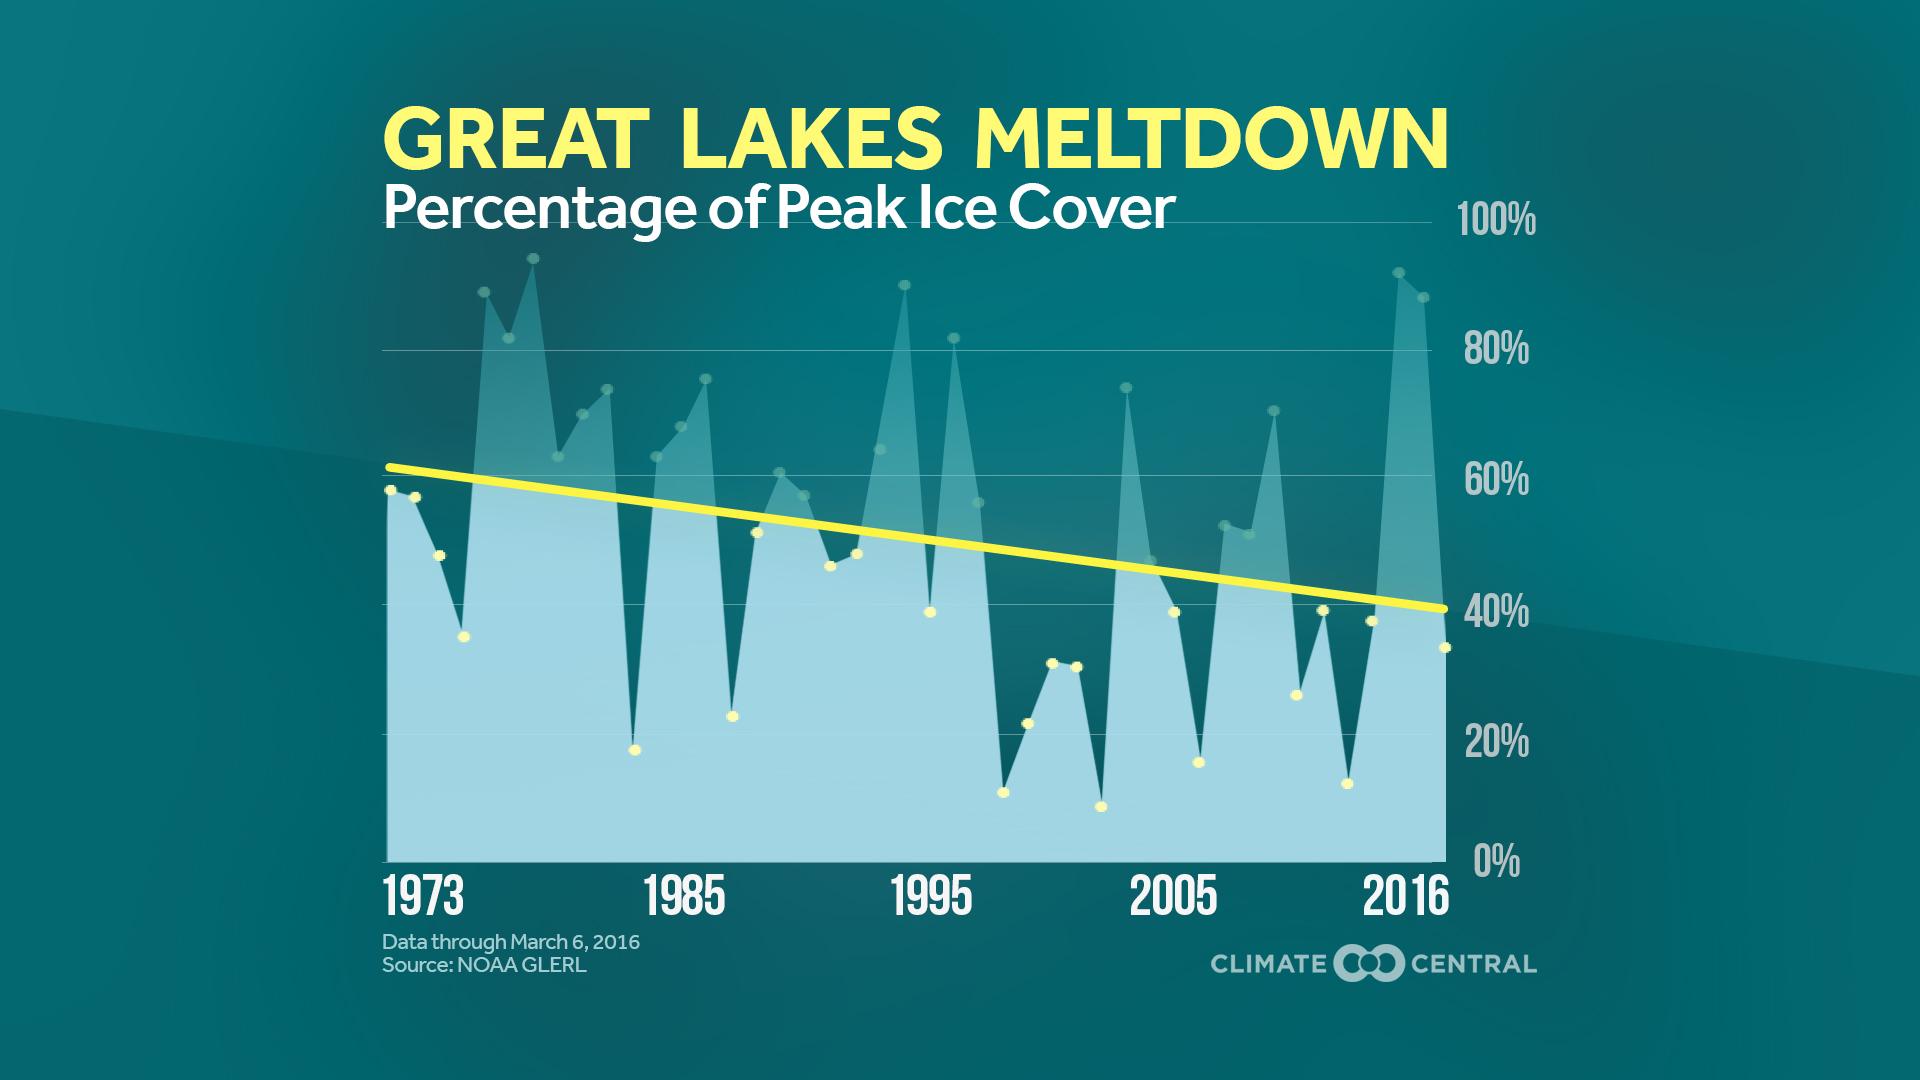 Picture Download File Lakes Meltdown Climate Matters Mov Vs Mp4 Youtube Mov Vs Mp4 Reddit dpreview Mov Vs Mp4